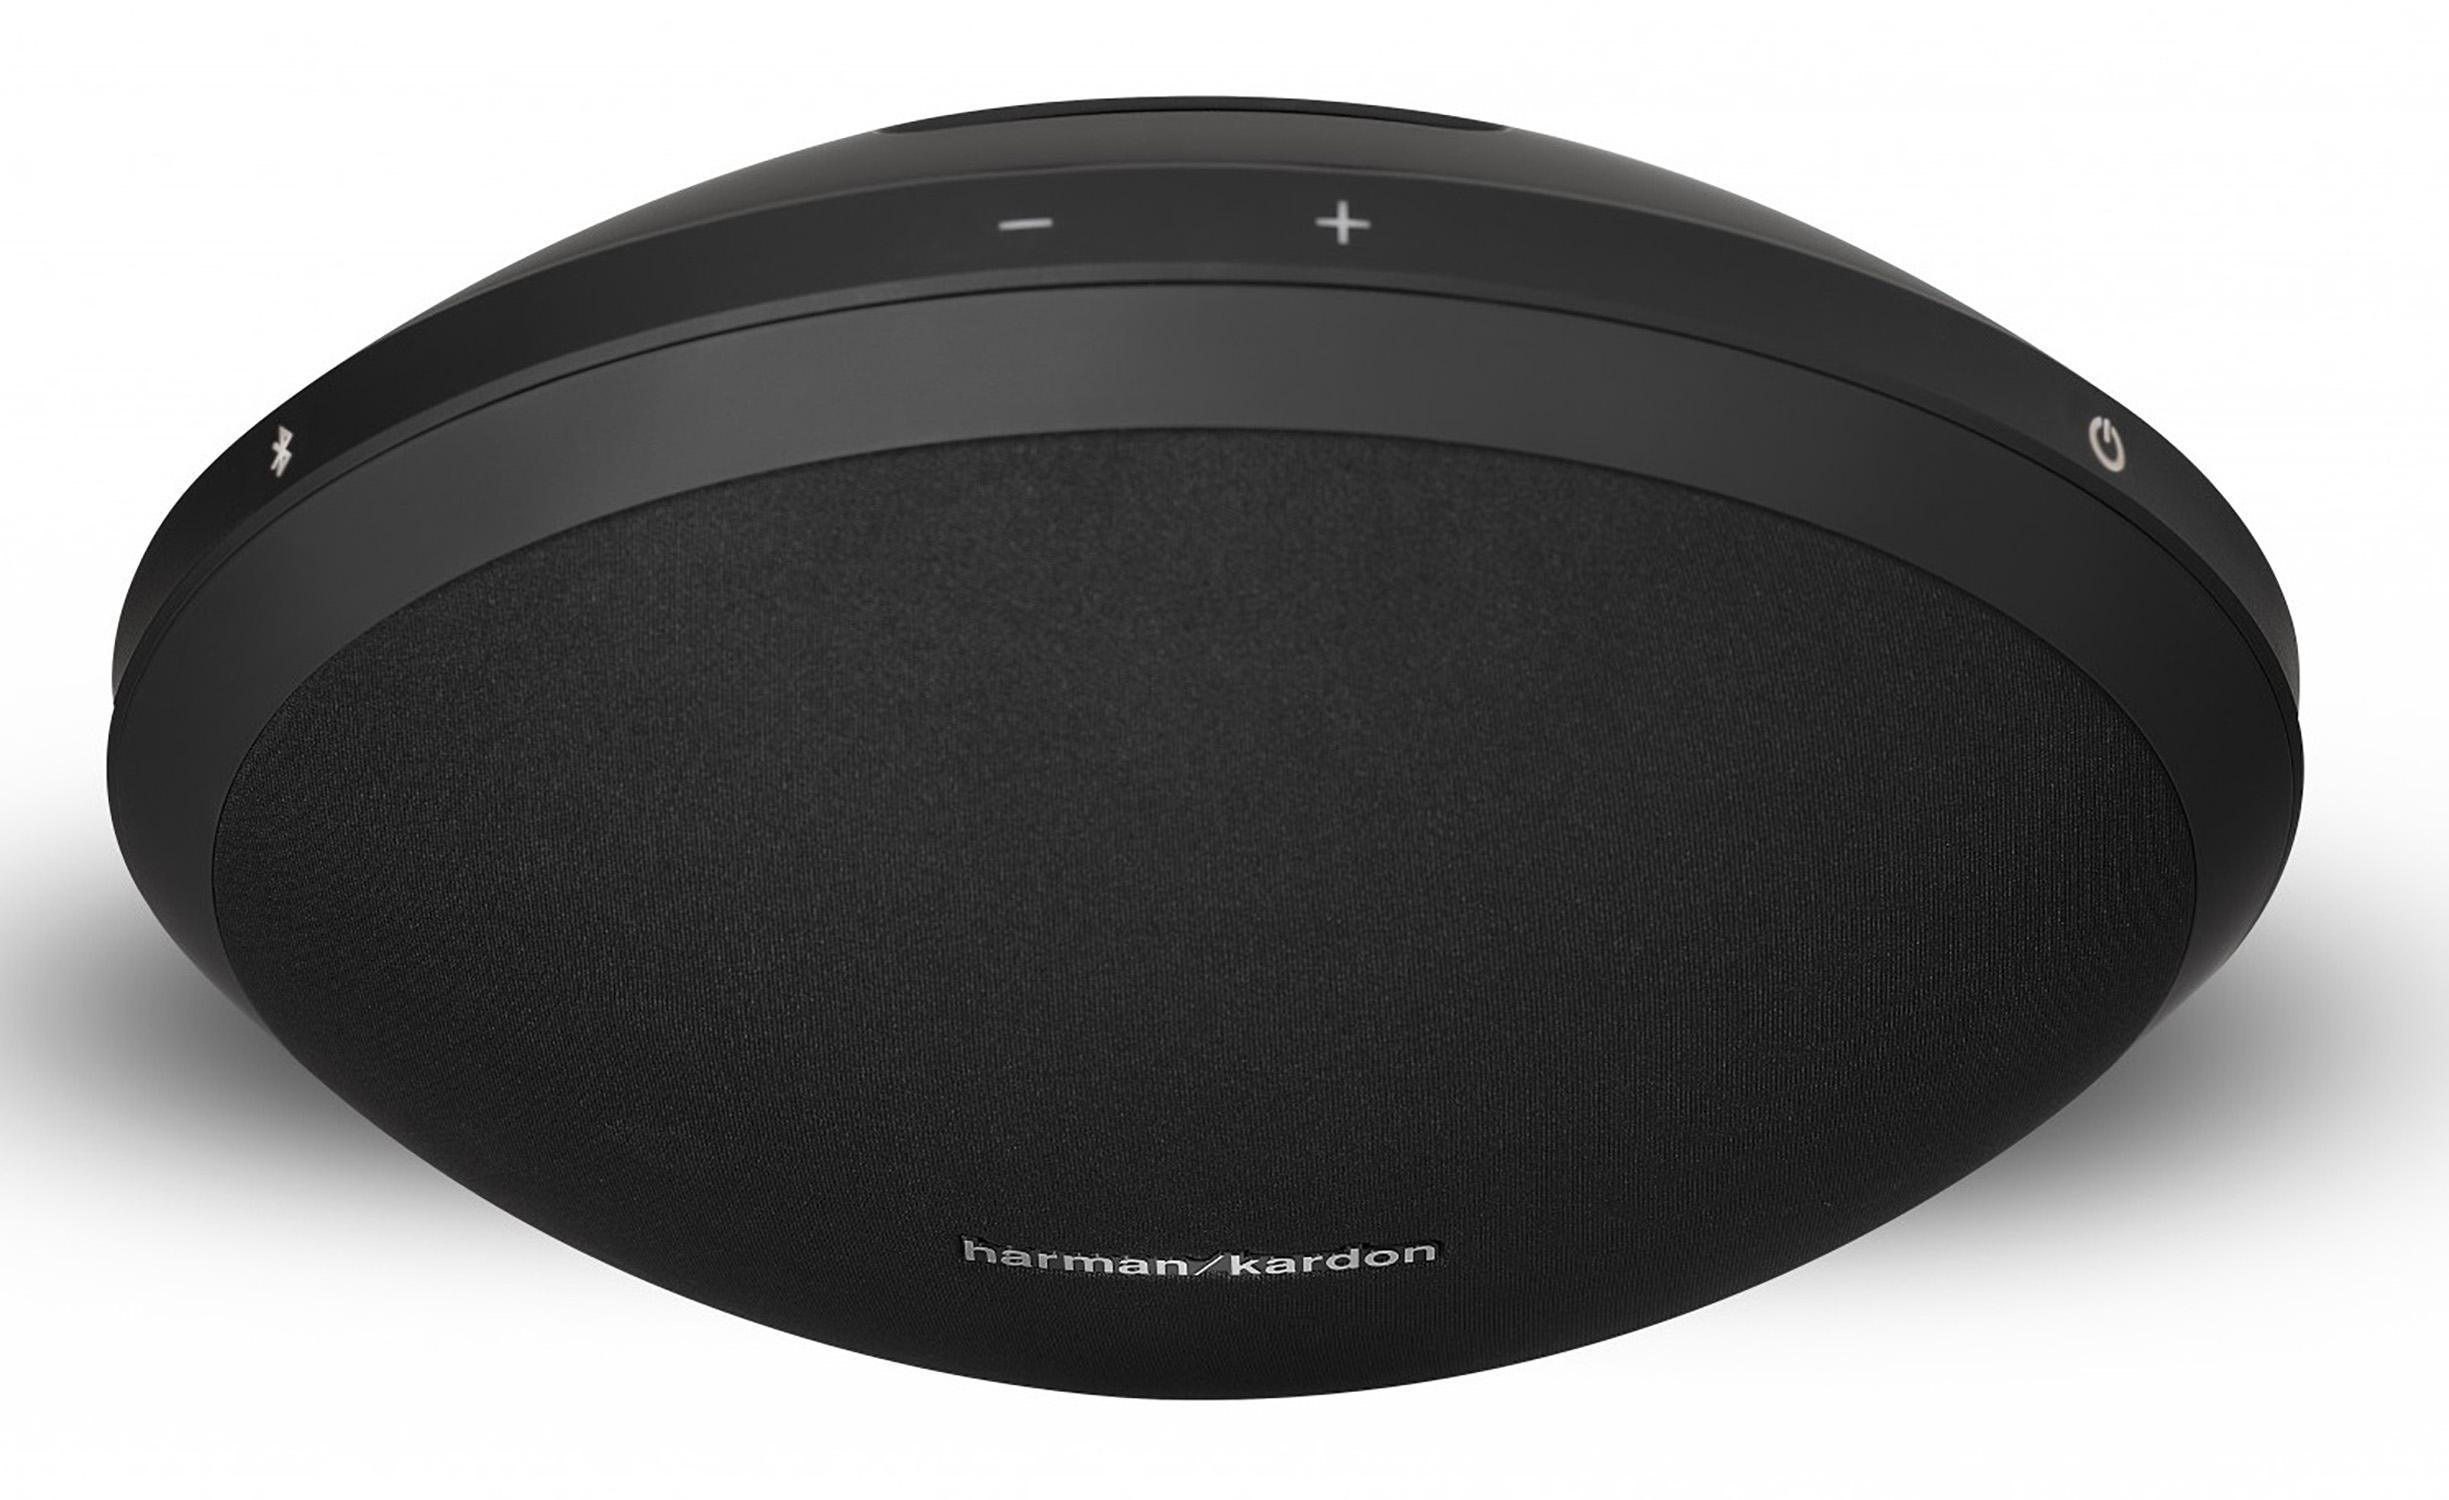 harman kardon onyx studio wireless portable speaker. Black Bedroom Furniture Sets. Home Design Ideas